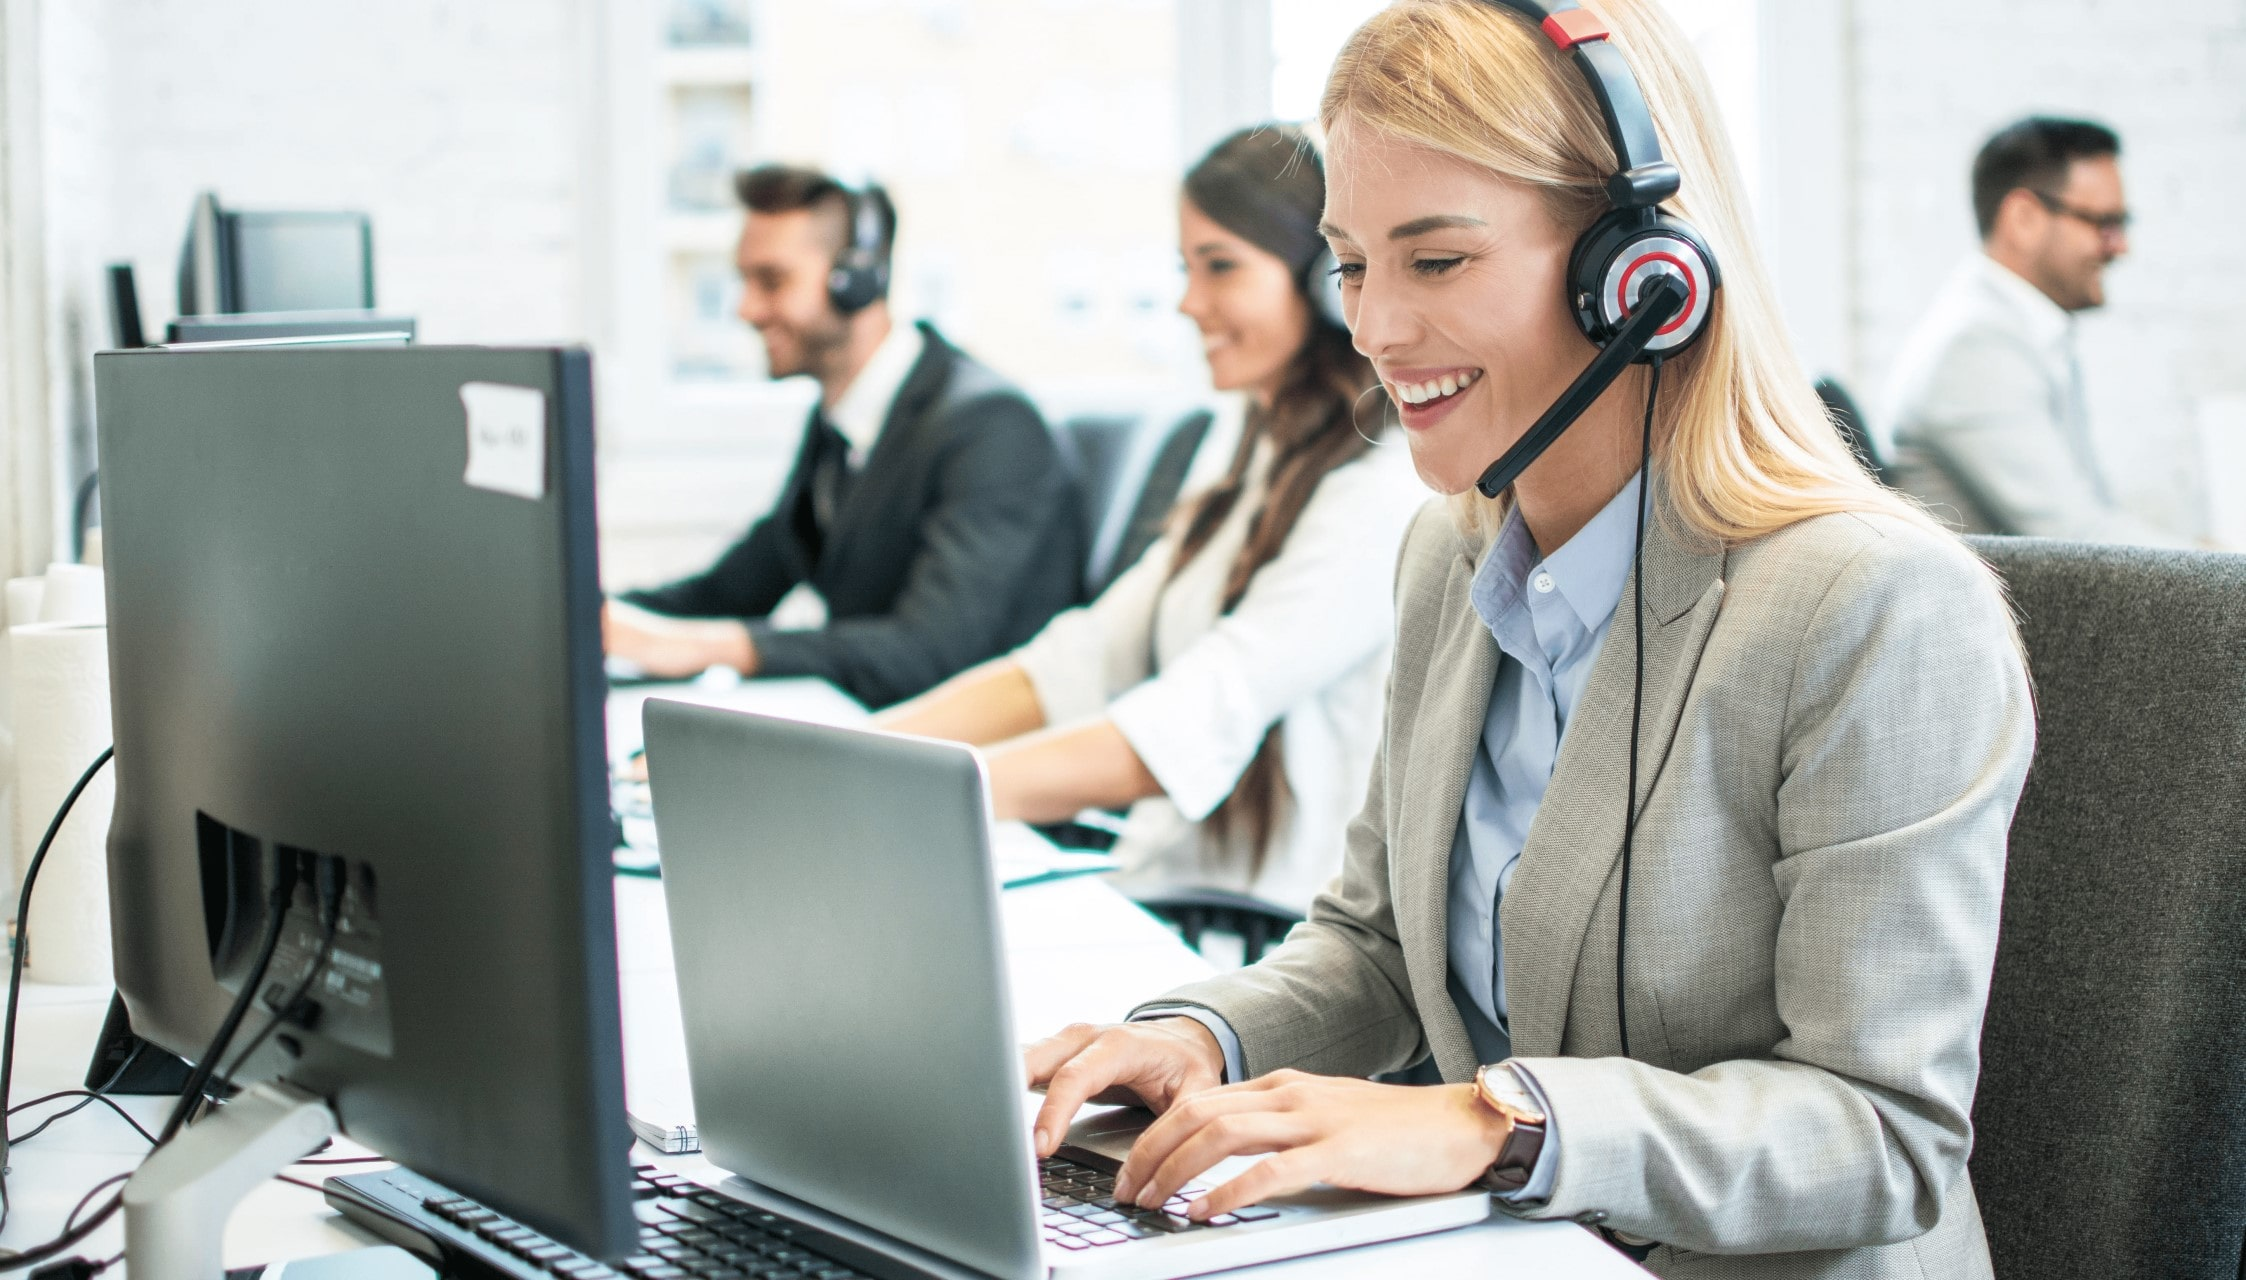 Express Virtual Meetings